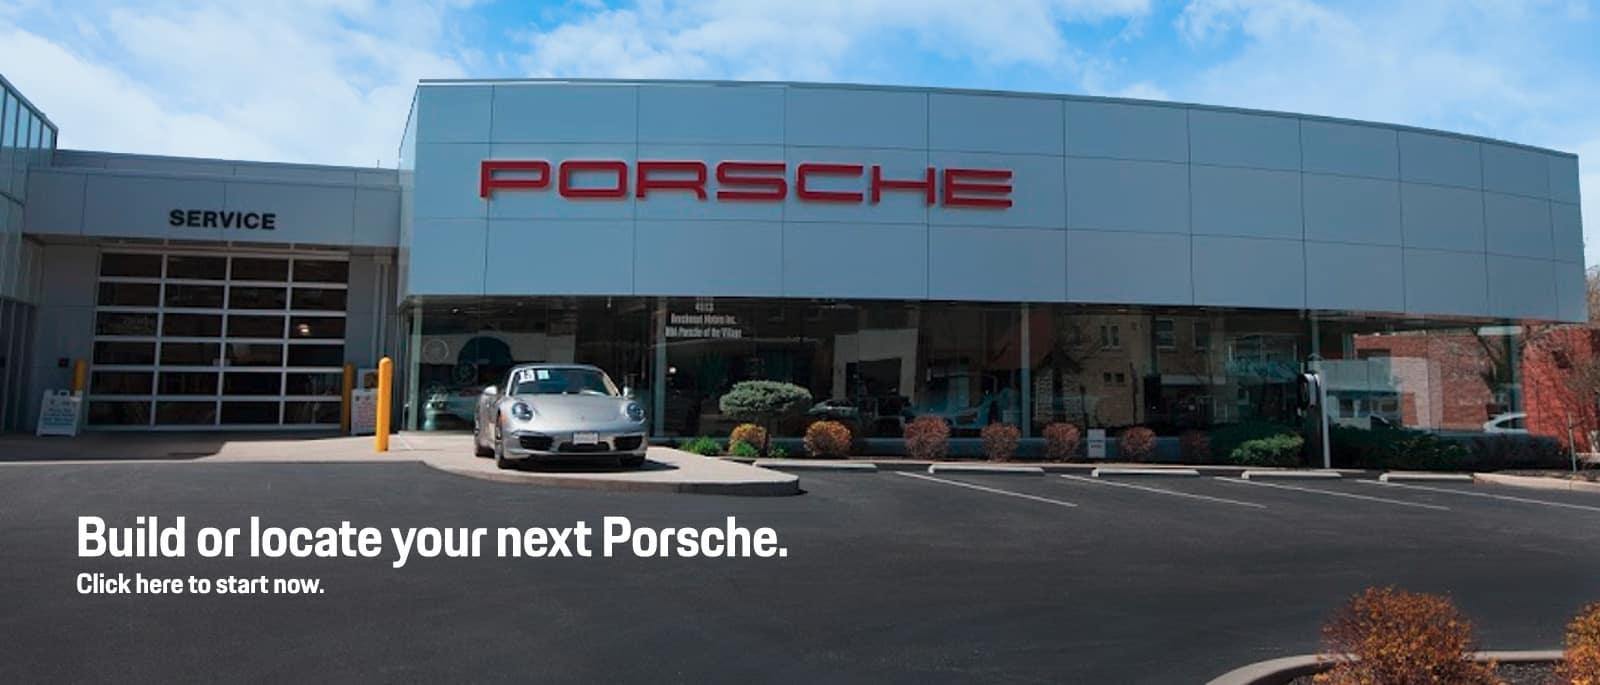 Porsche-Slide_Build_Locate_IMG_3